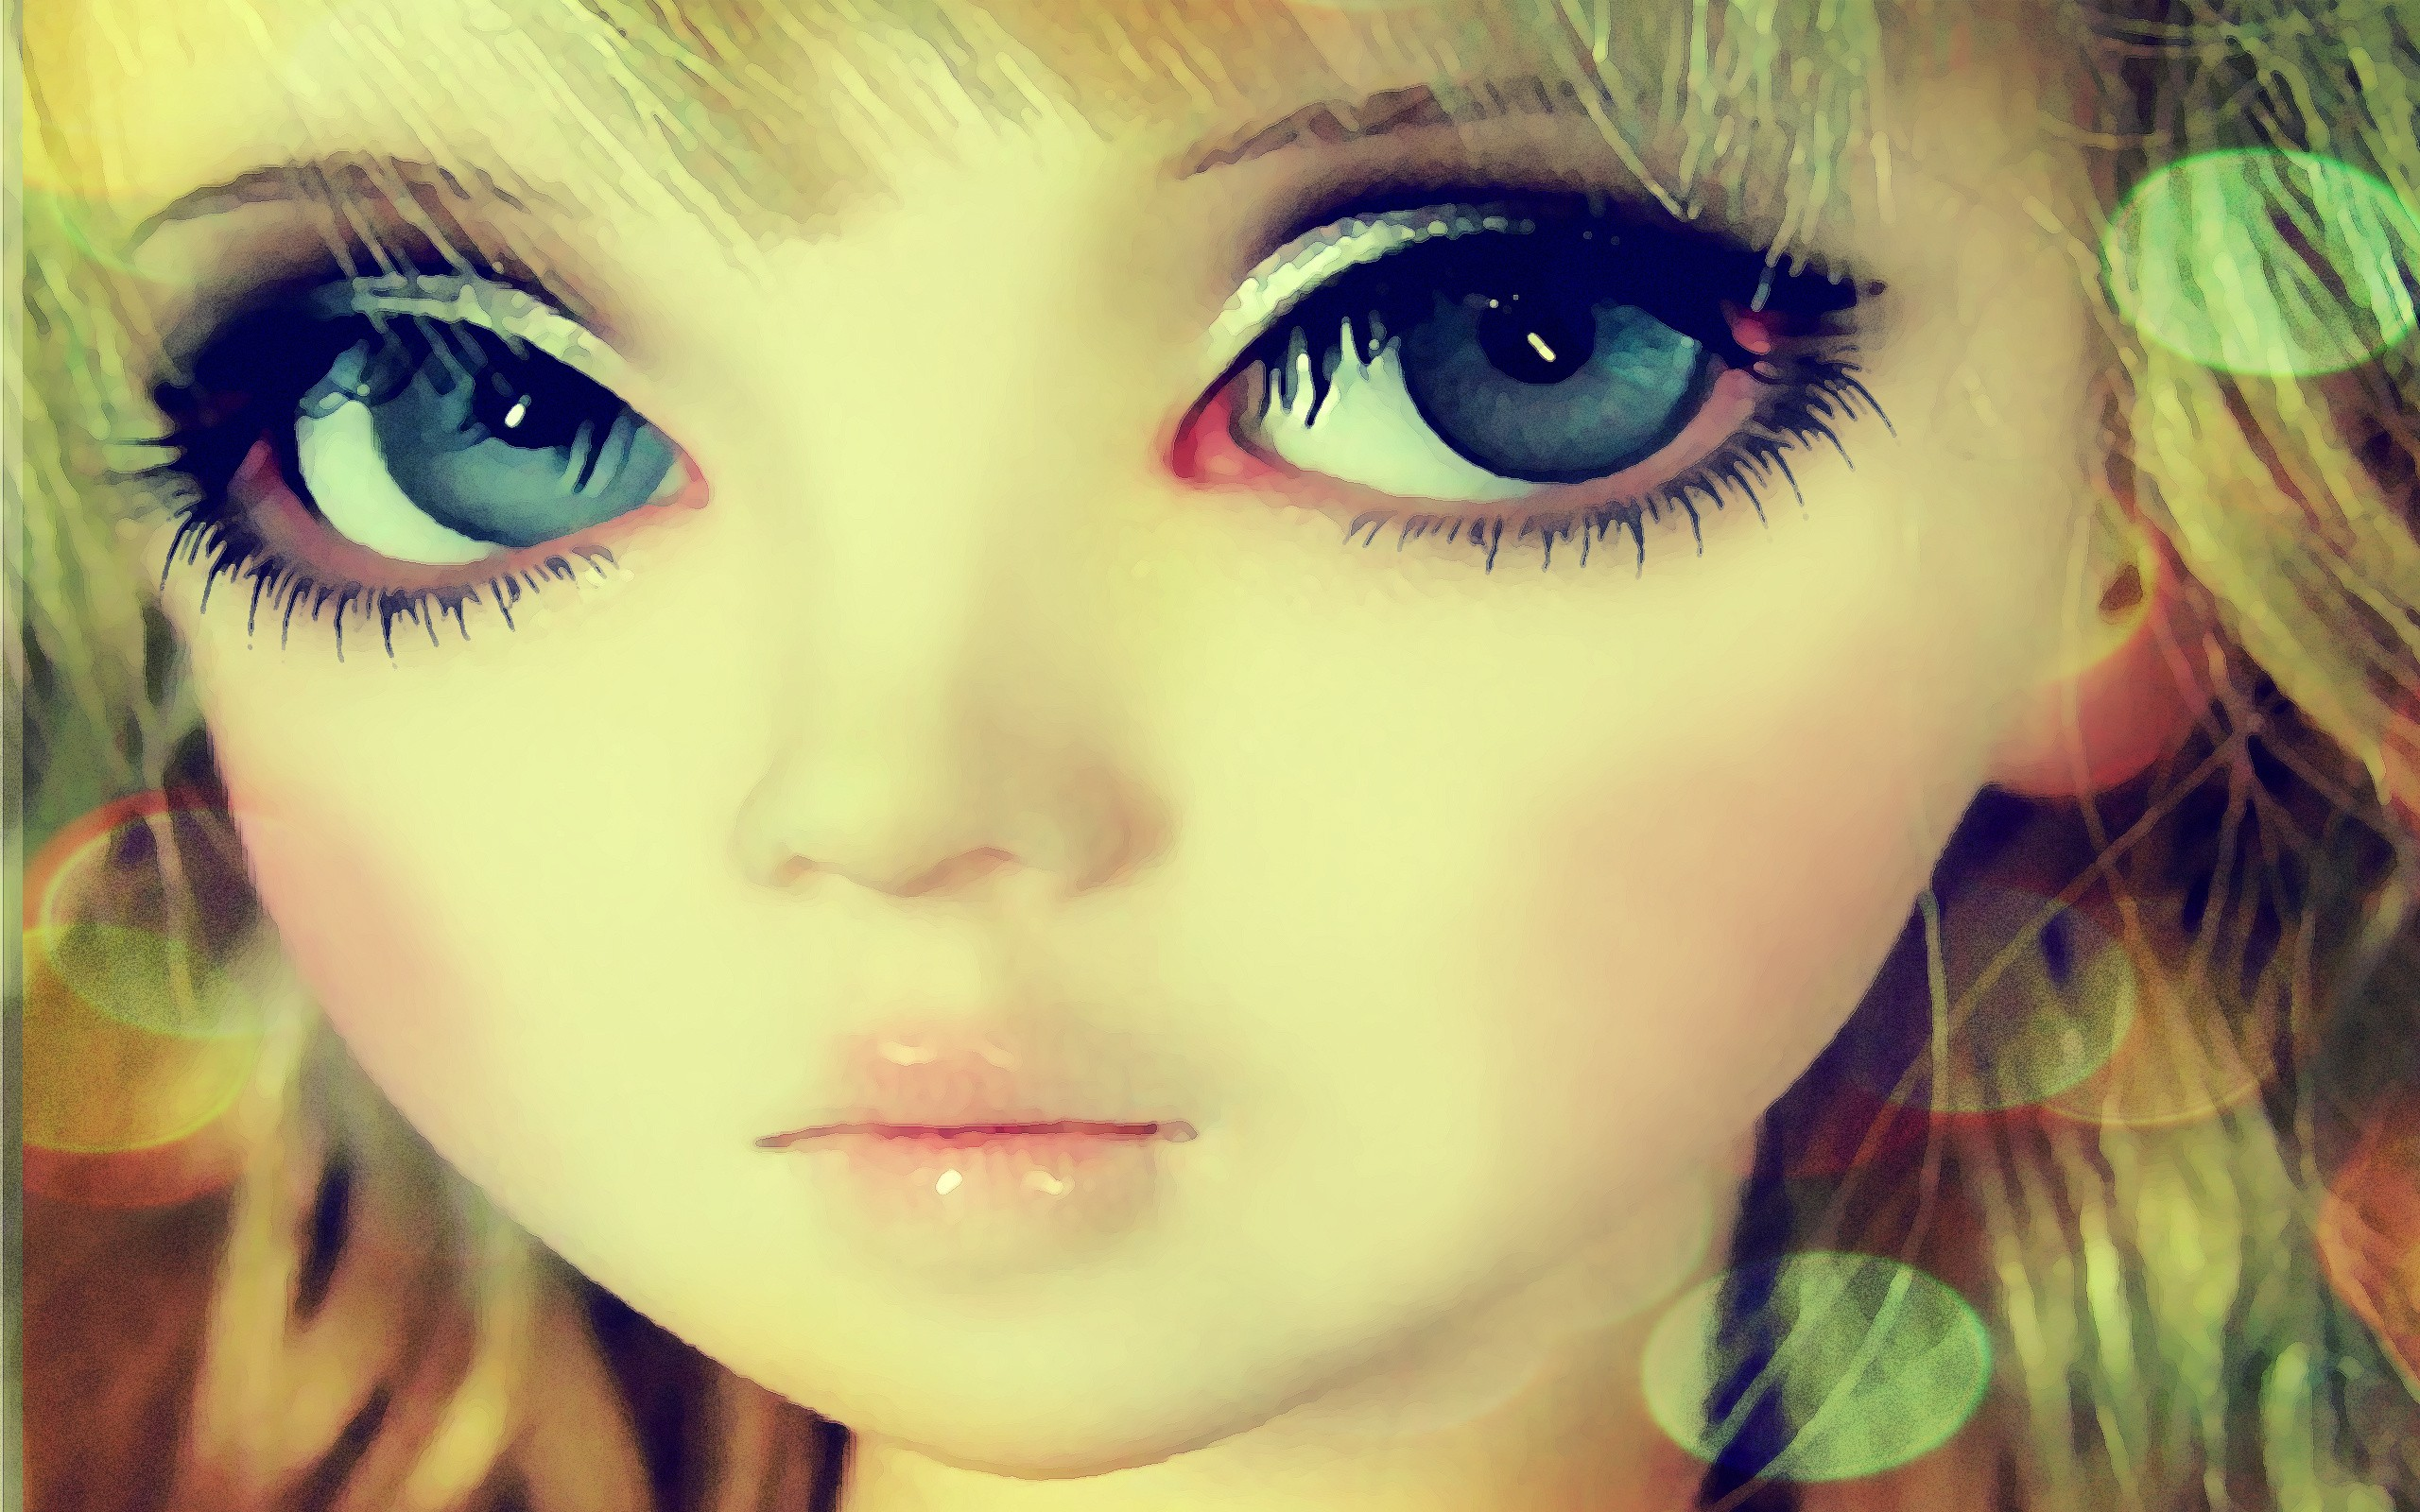 blondes big eyes drawings faces doll bjd wallpaper 2560x1600